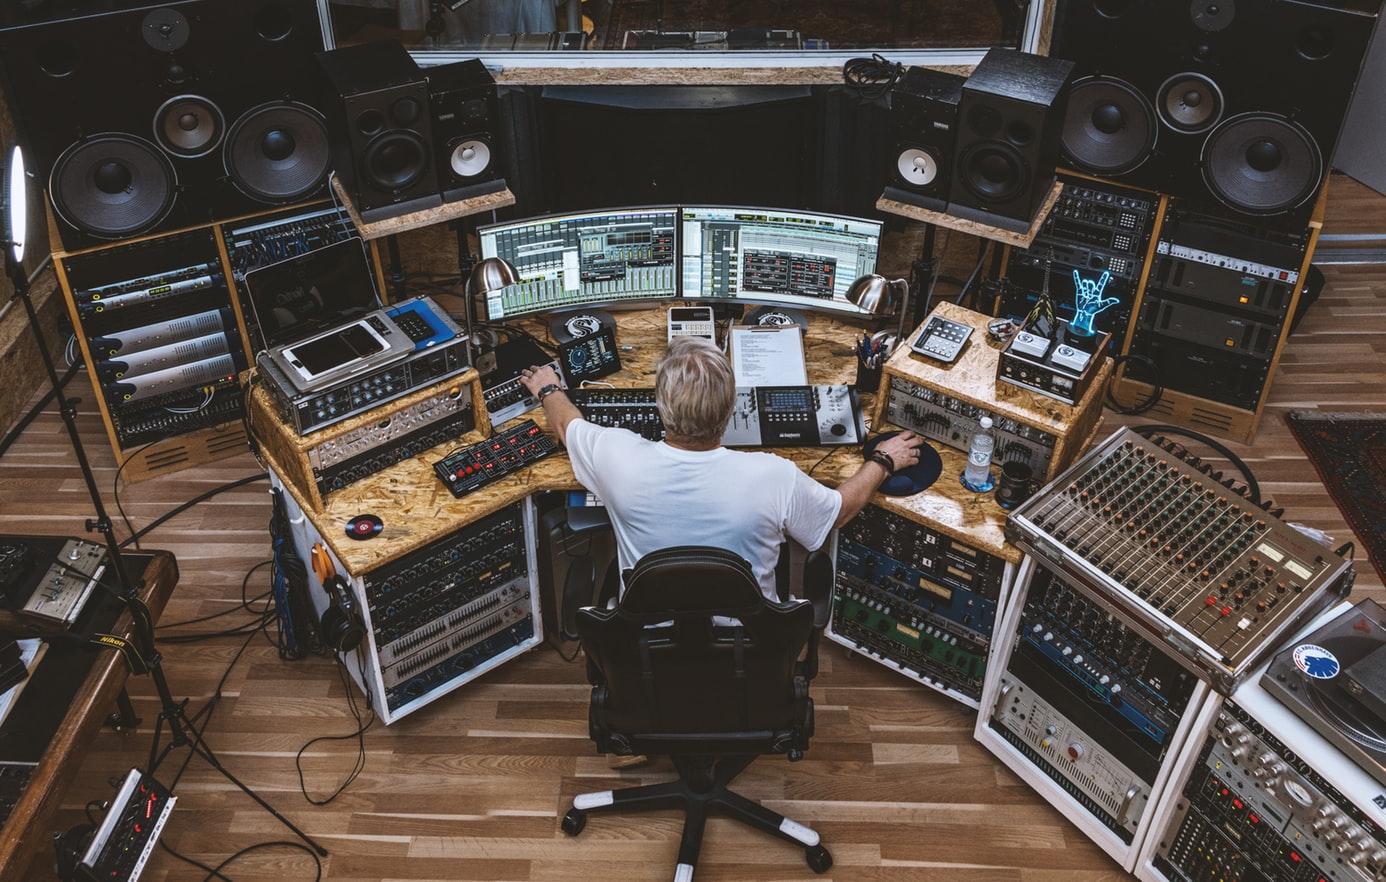 audio editing equipment setup